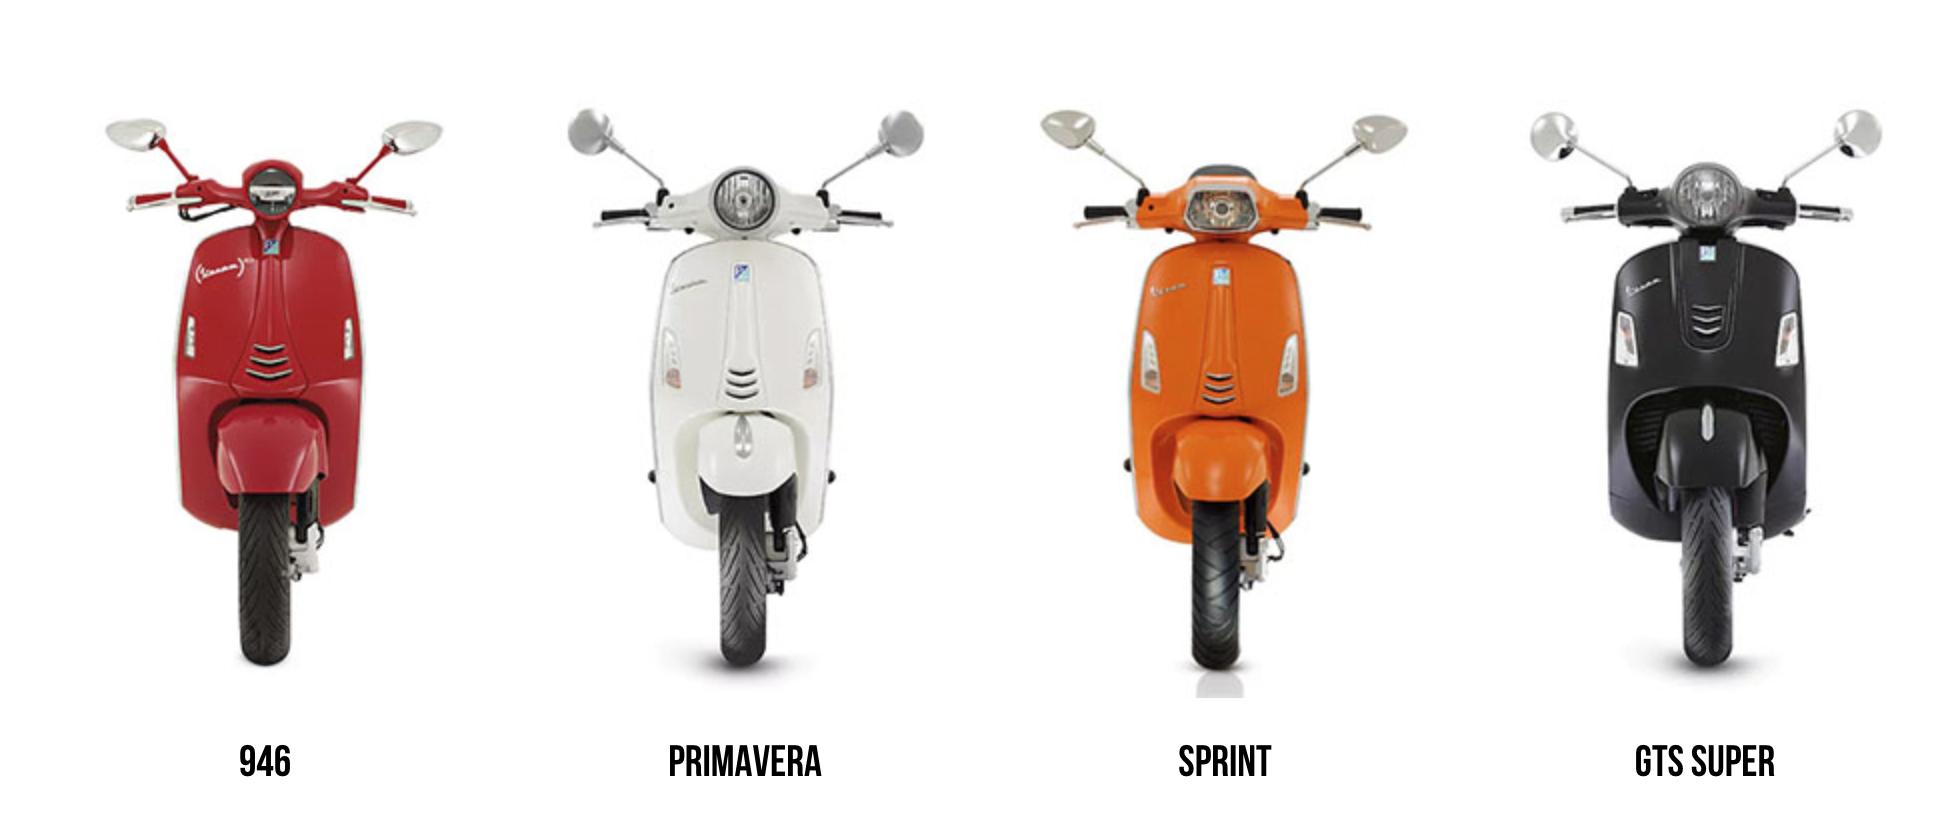 http://bonovo.motoccs.com/fileuploads/Banners/_motoccs_motas_botas_capacetes_aceleras_vespas_yamaha_banner_vespas.png